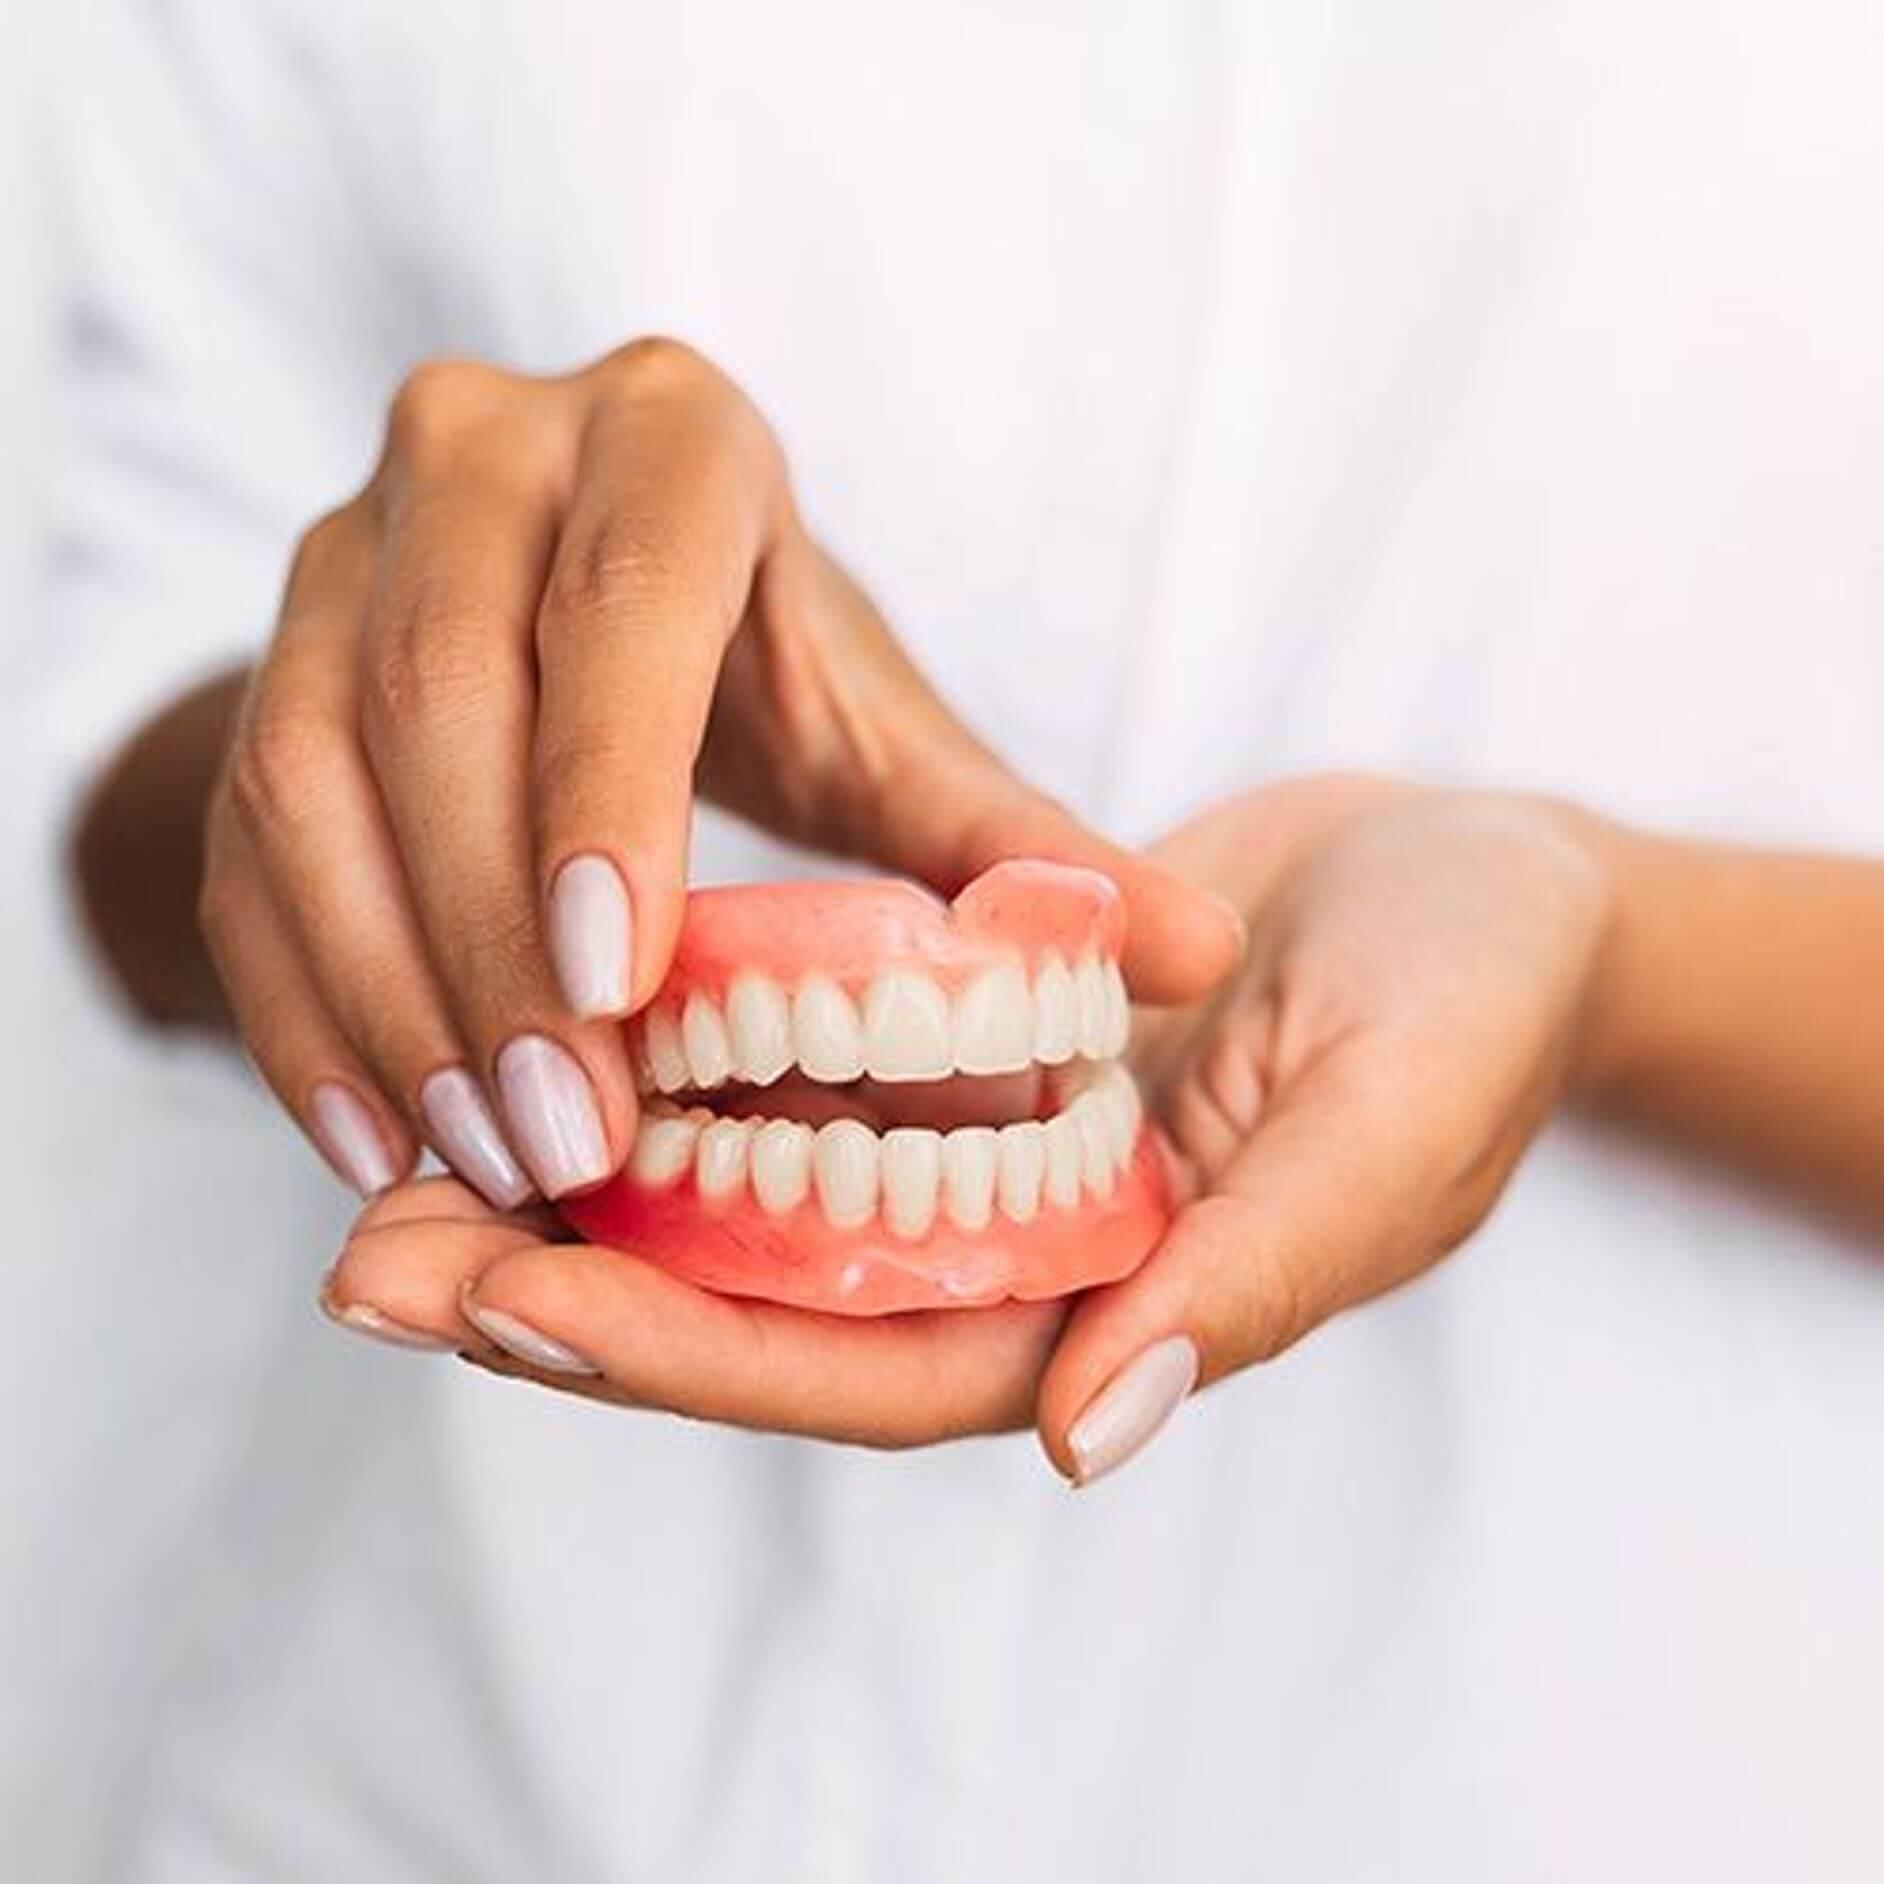 دندان مصنوعی و سالمندان